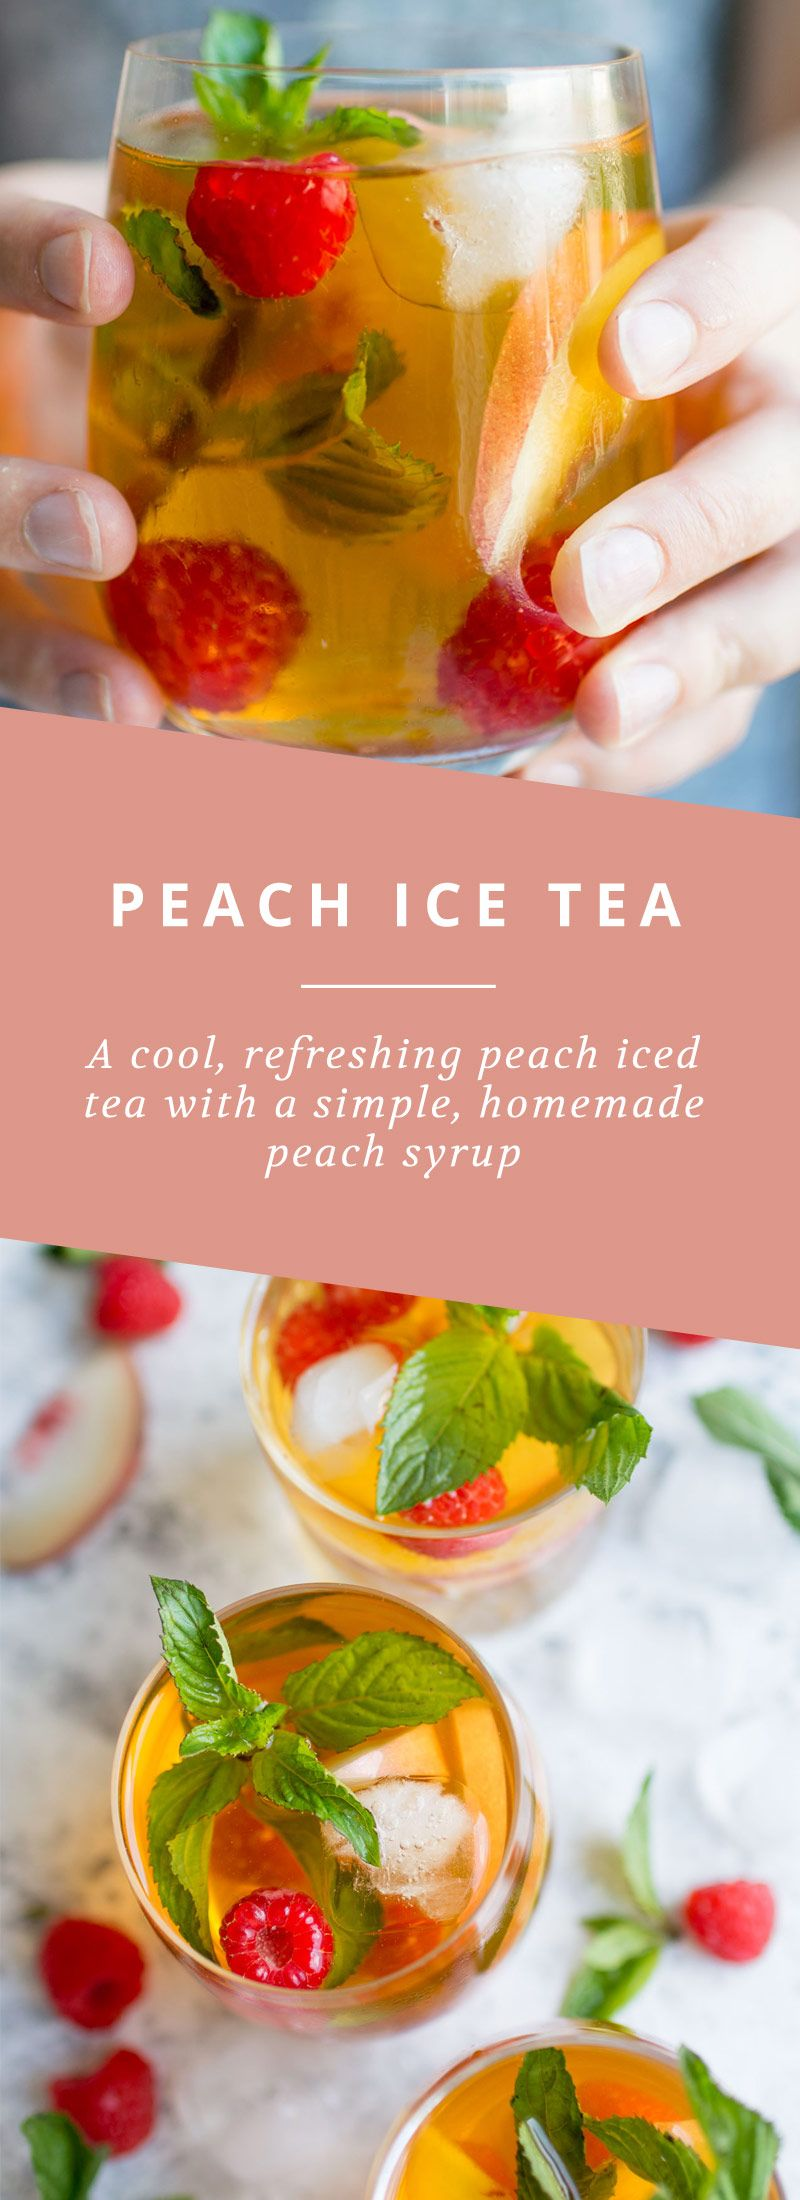 homemade peach ice tea レシピ 紅茶